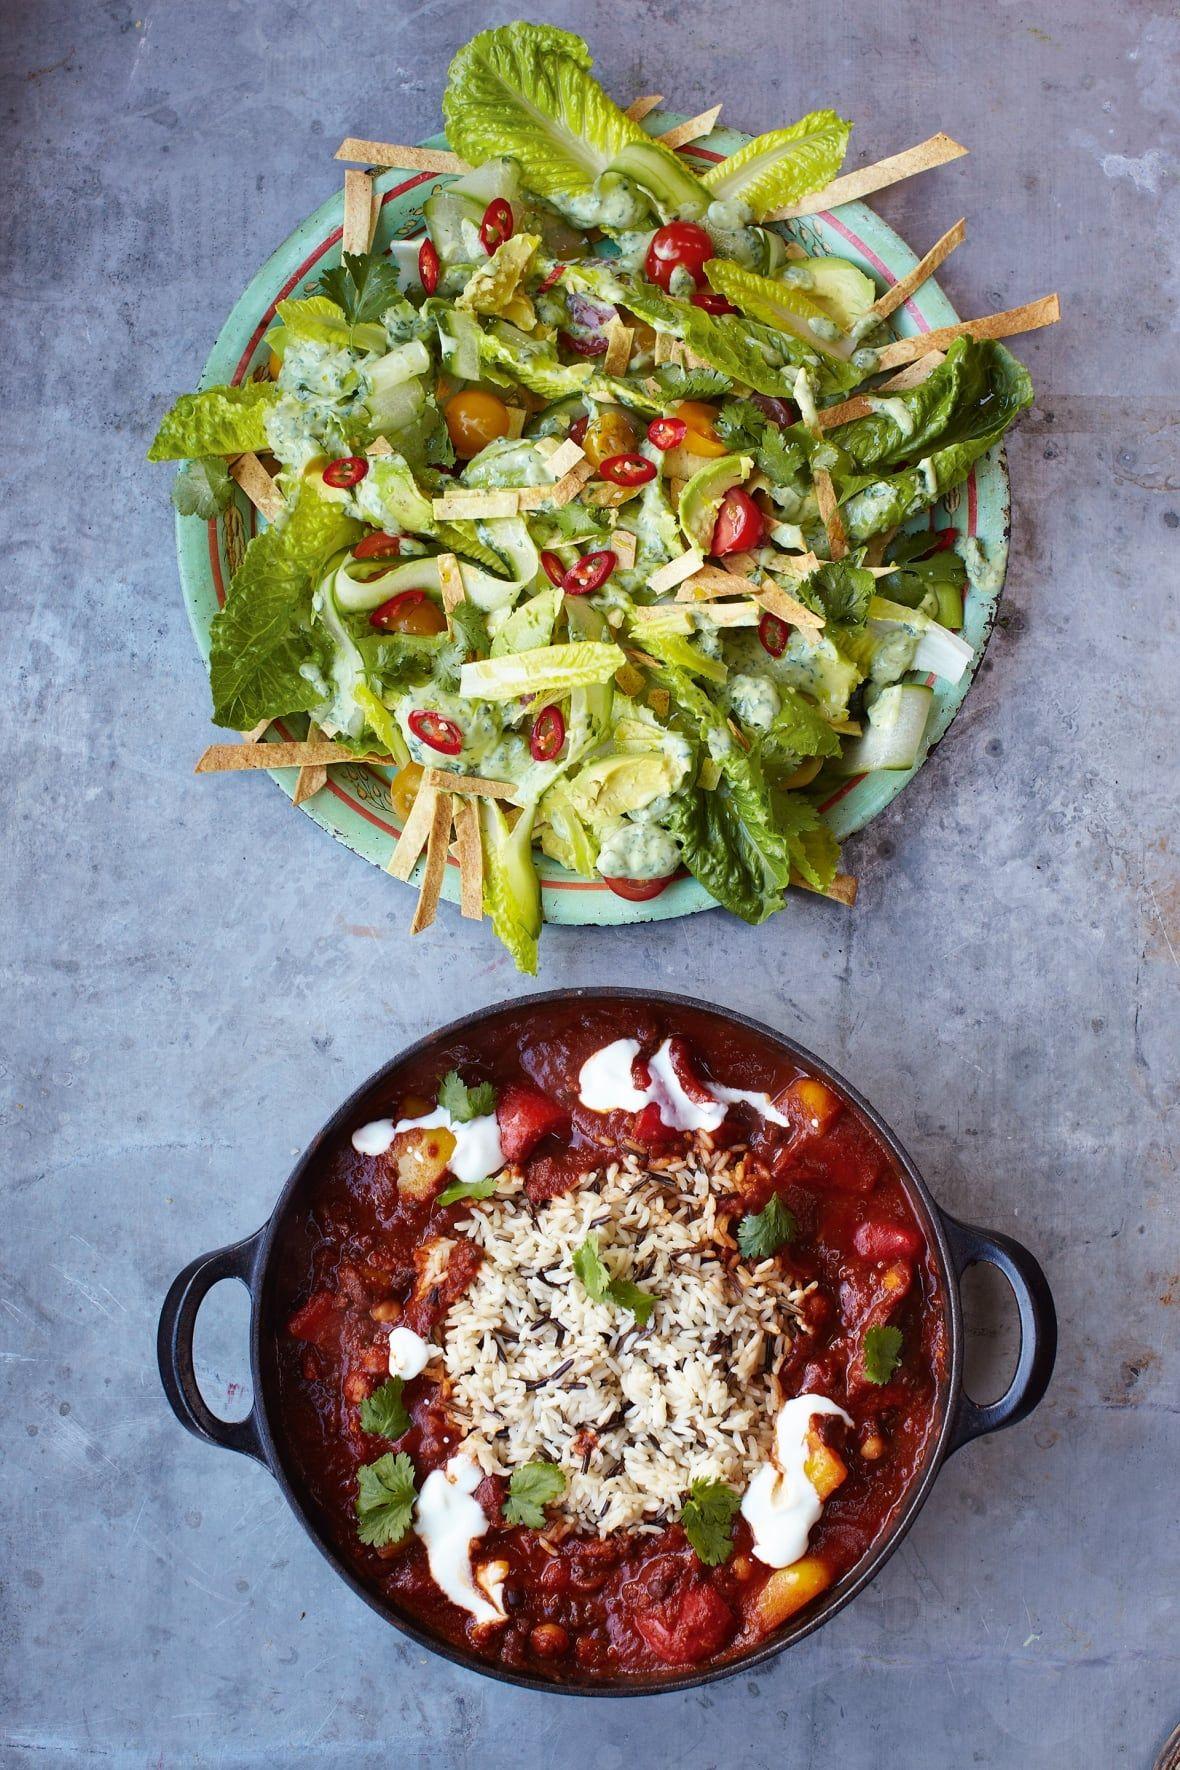 Jamie Oliver S 15 Minute Meals Veggie Chili With Crunchy Tortilla Avocado Salad Recipe In 2020 Veggie Chili Cooked Vegetable Recipes Yummy Vegetable Recipes